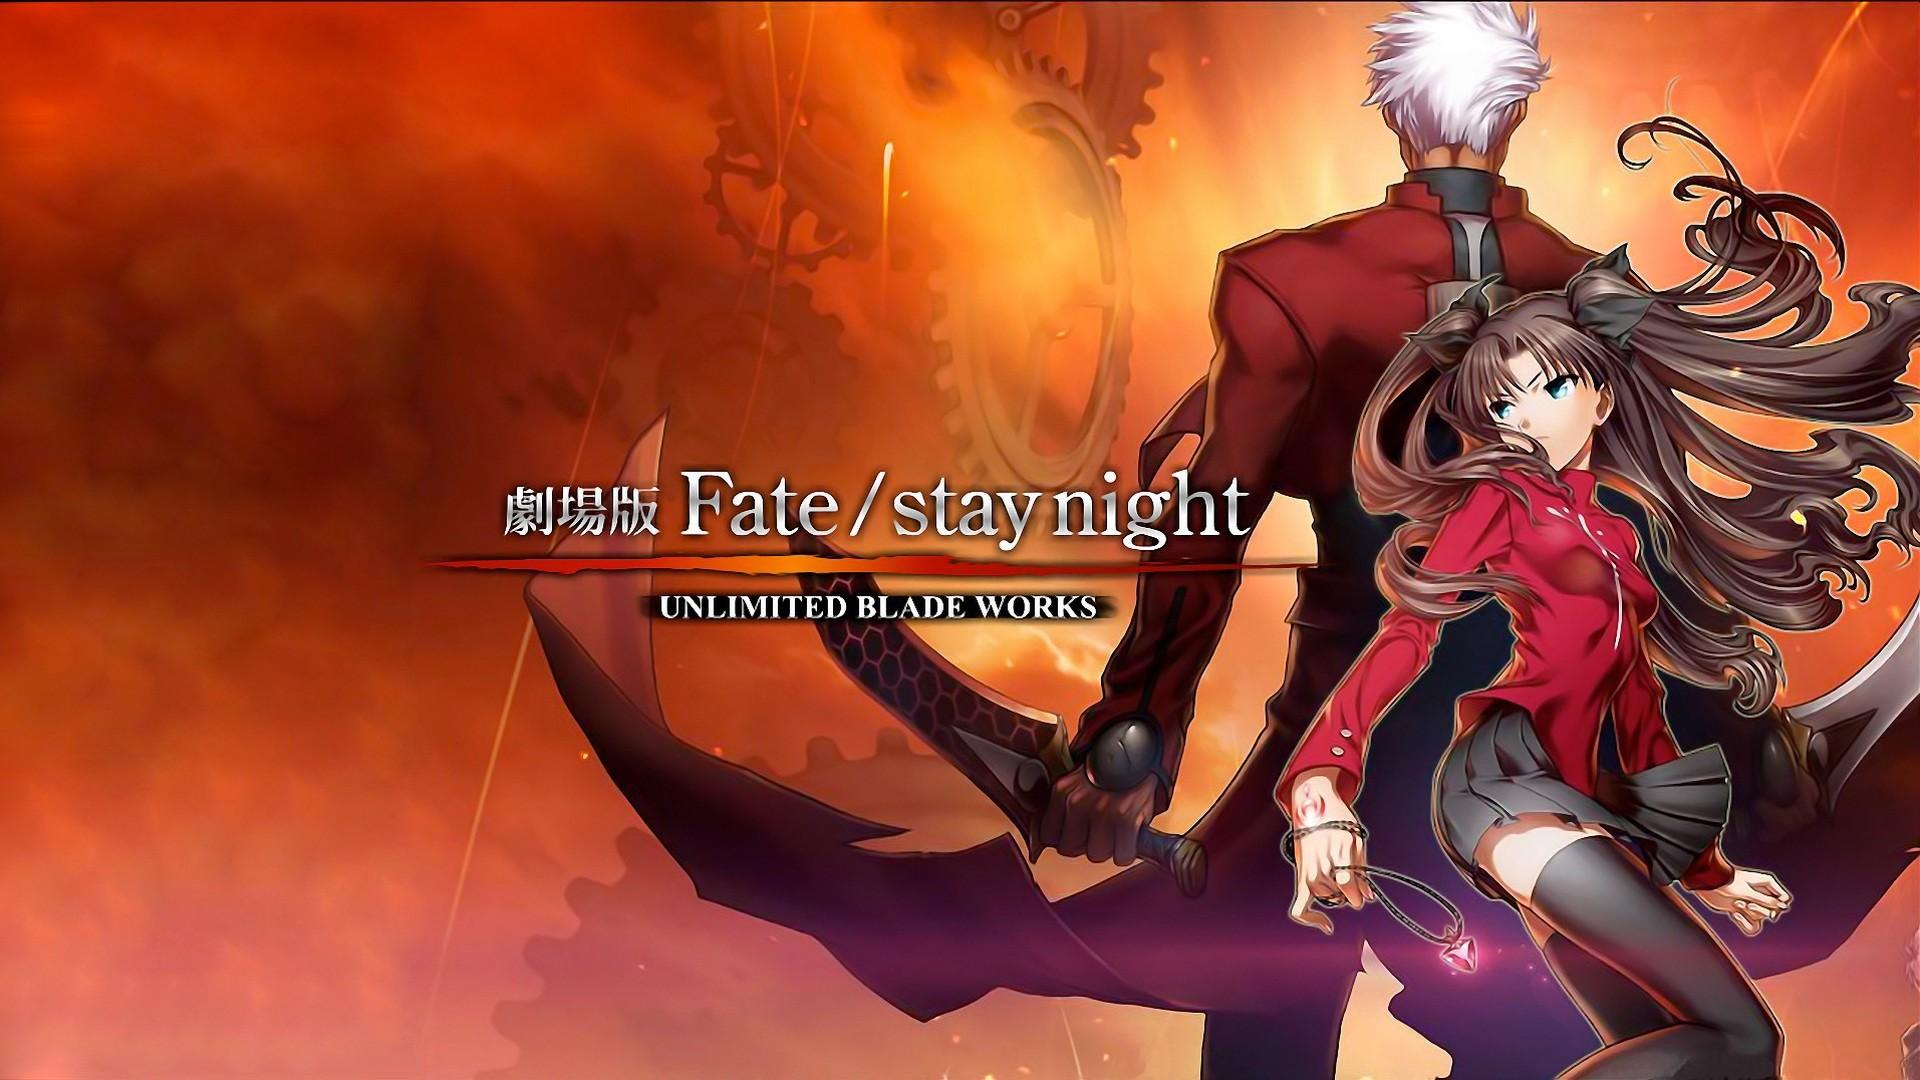 Fate Stay Night Wallpaper Archer 36 Free Hd Wallpaper – Animewp.com